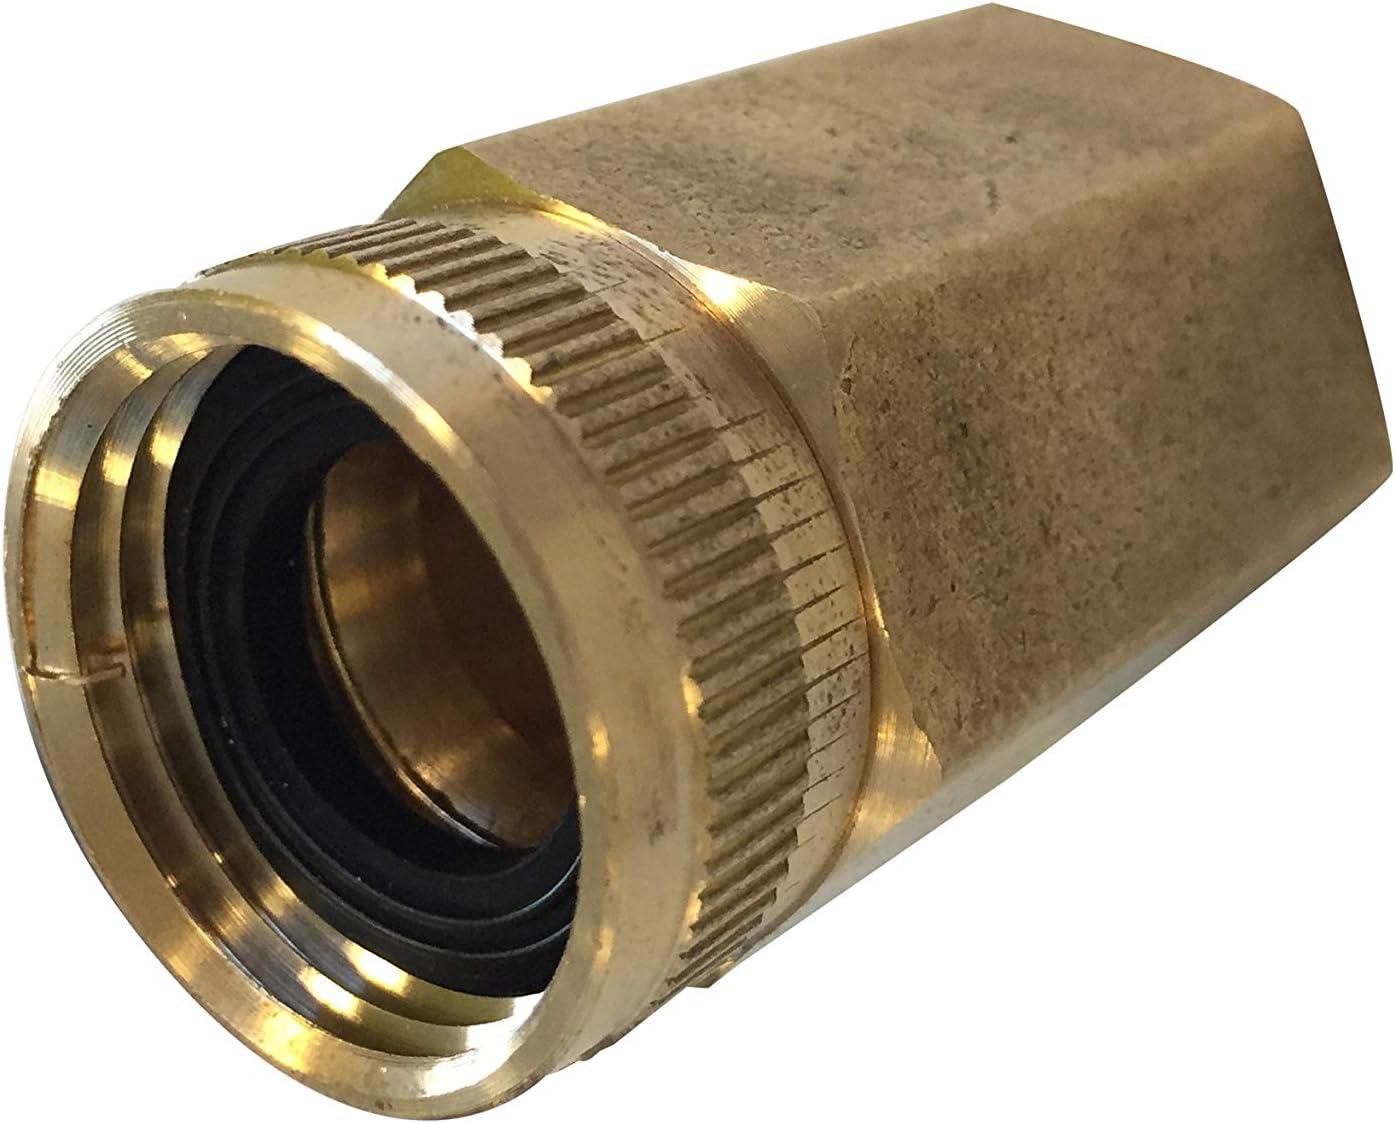 "Sun Joe SPX-BSCXL Dual Swivel 2"" X-Large Brass Connector 3/4-in x 3/4-in, Fits SPX pressure washer series"